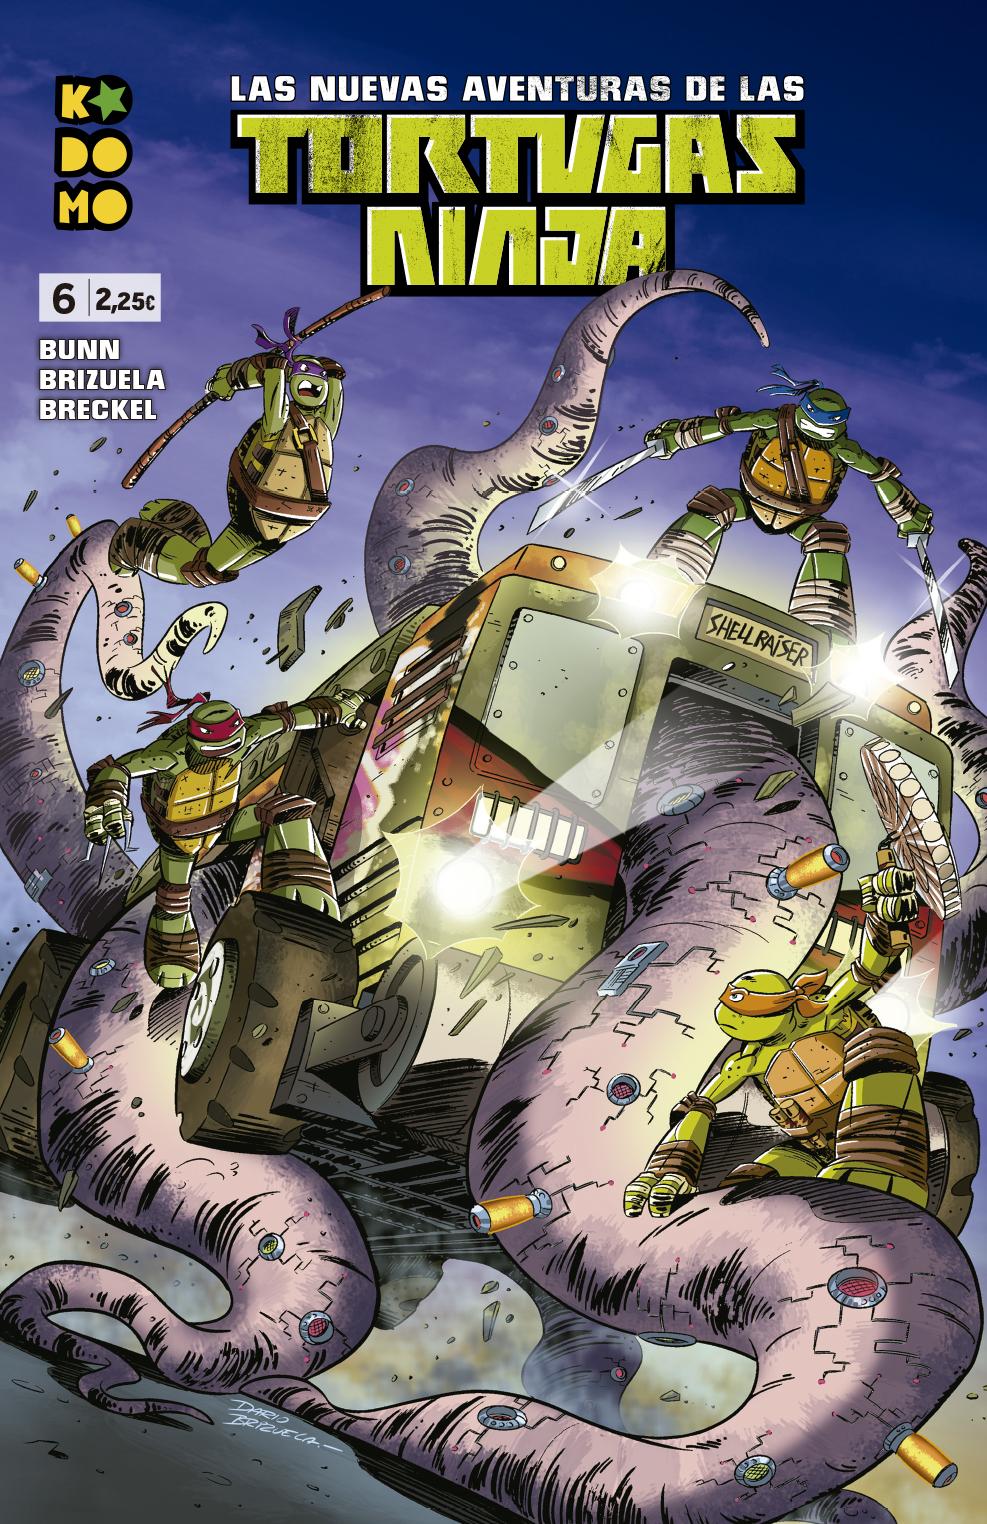 Las nuevas aventuras de las Tortugas Ninja núm. 06